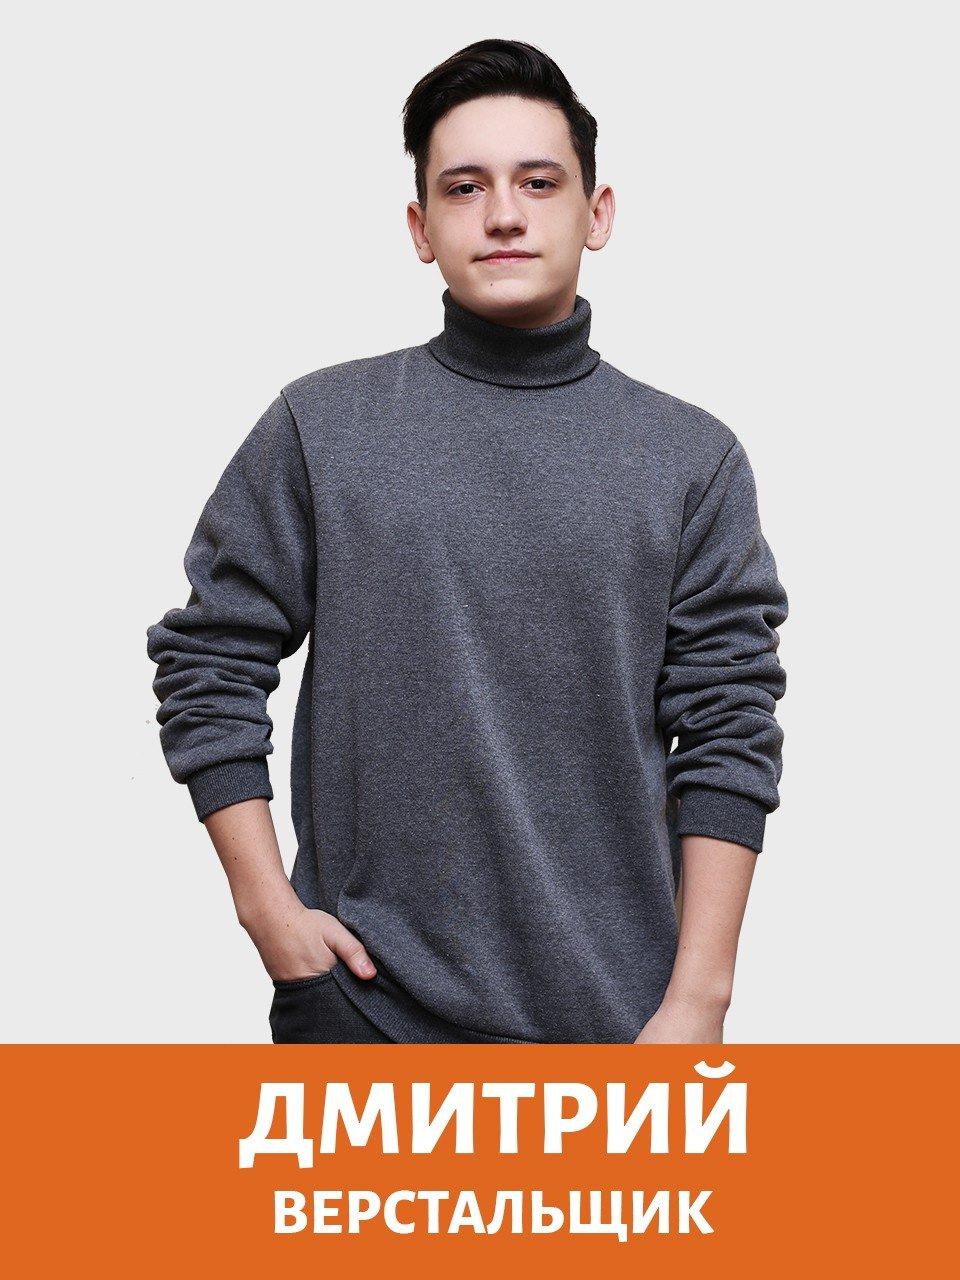 dmitrij verstalshhik - Главная